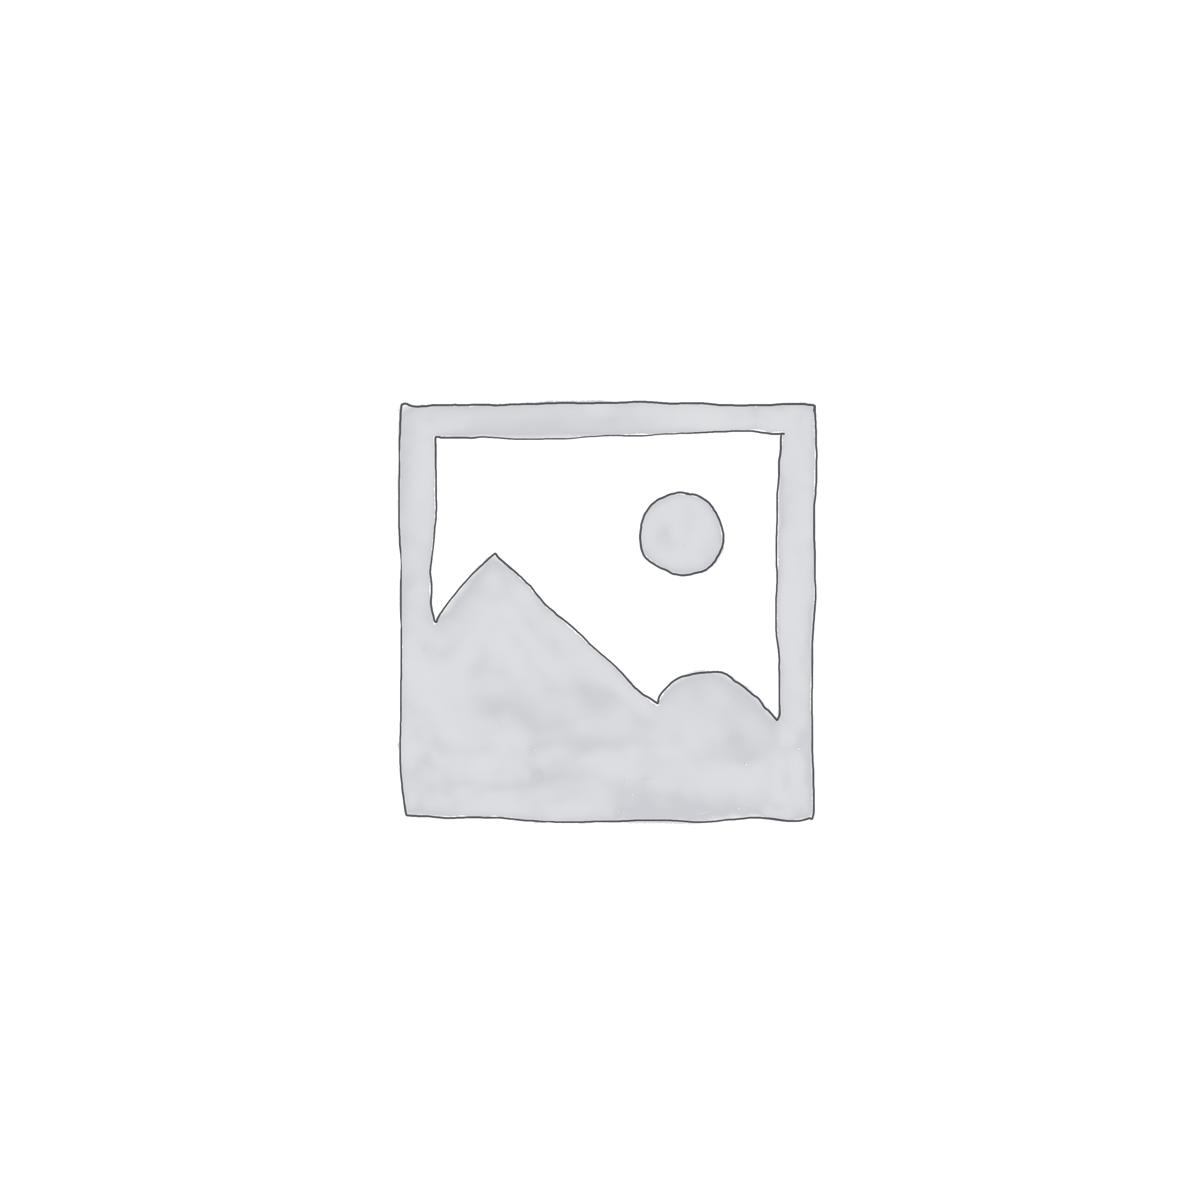 Soft Terrazzo Wallpaper Mural